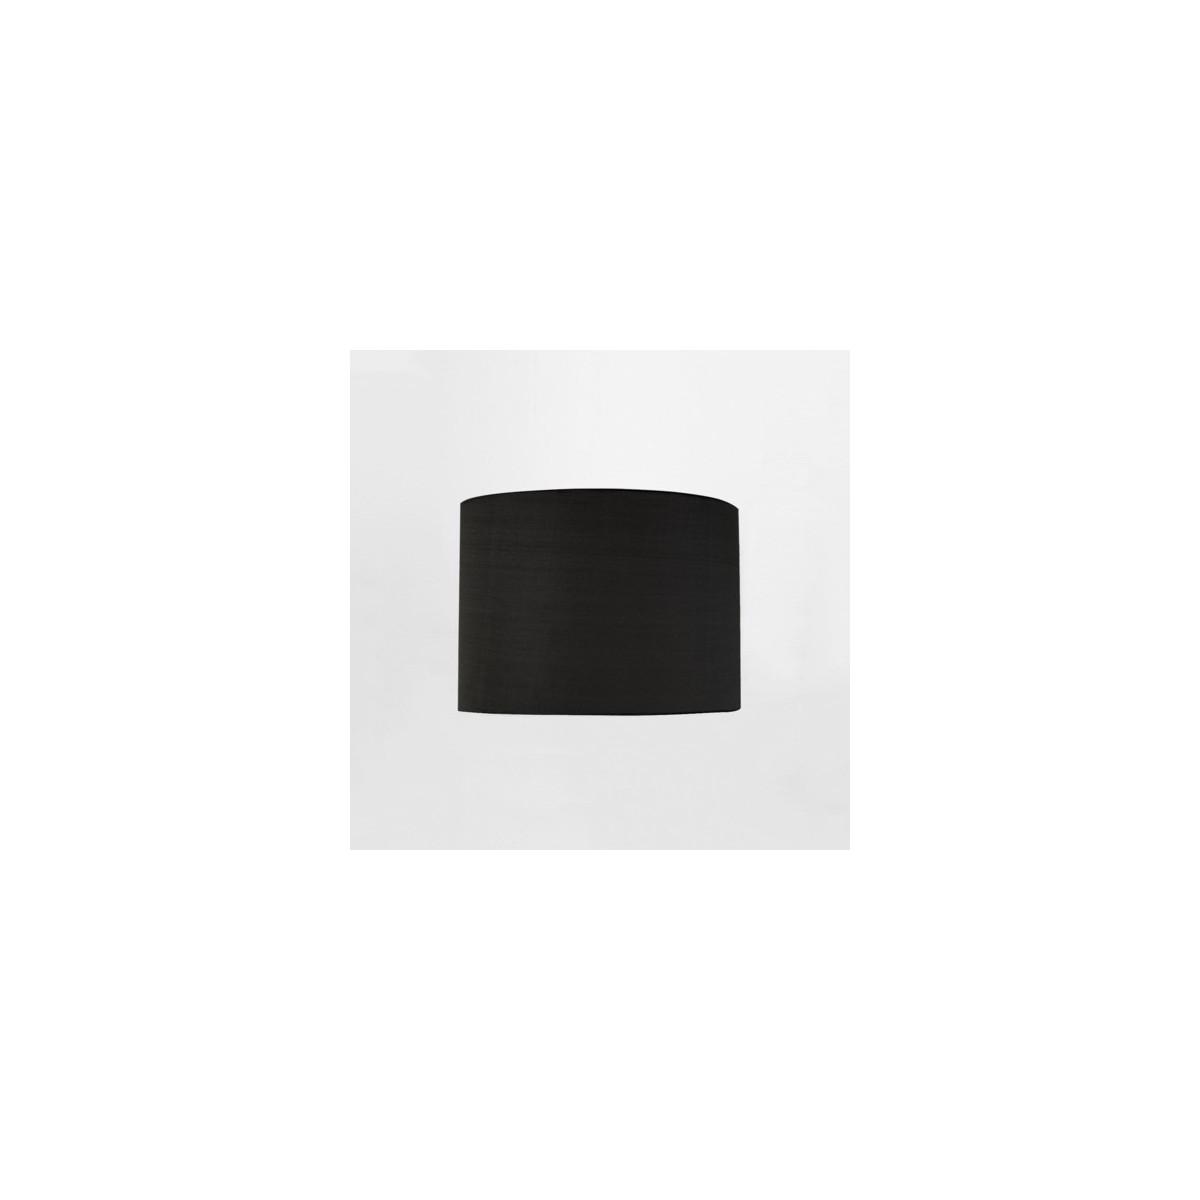 Astro Drum 200 Abażur Czarny 5016021